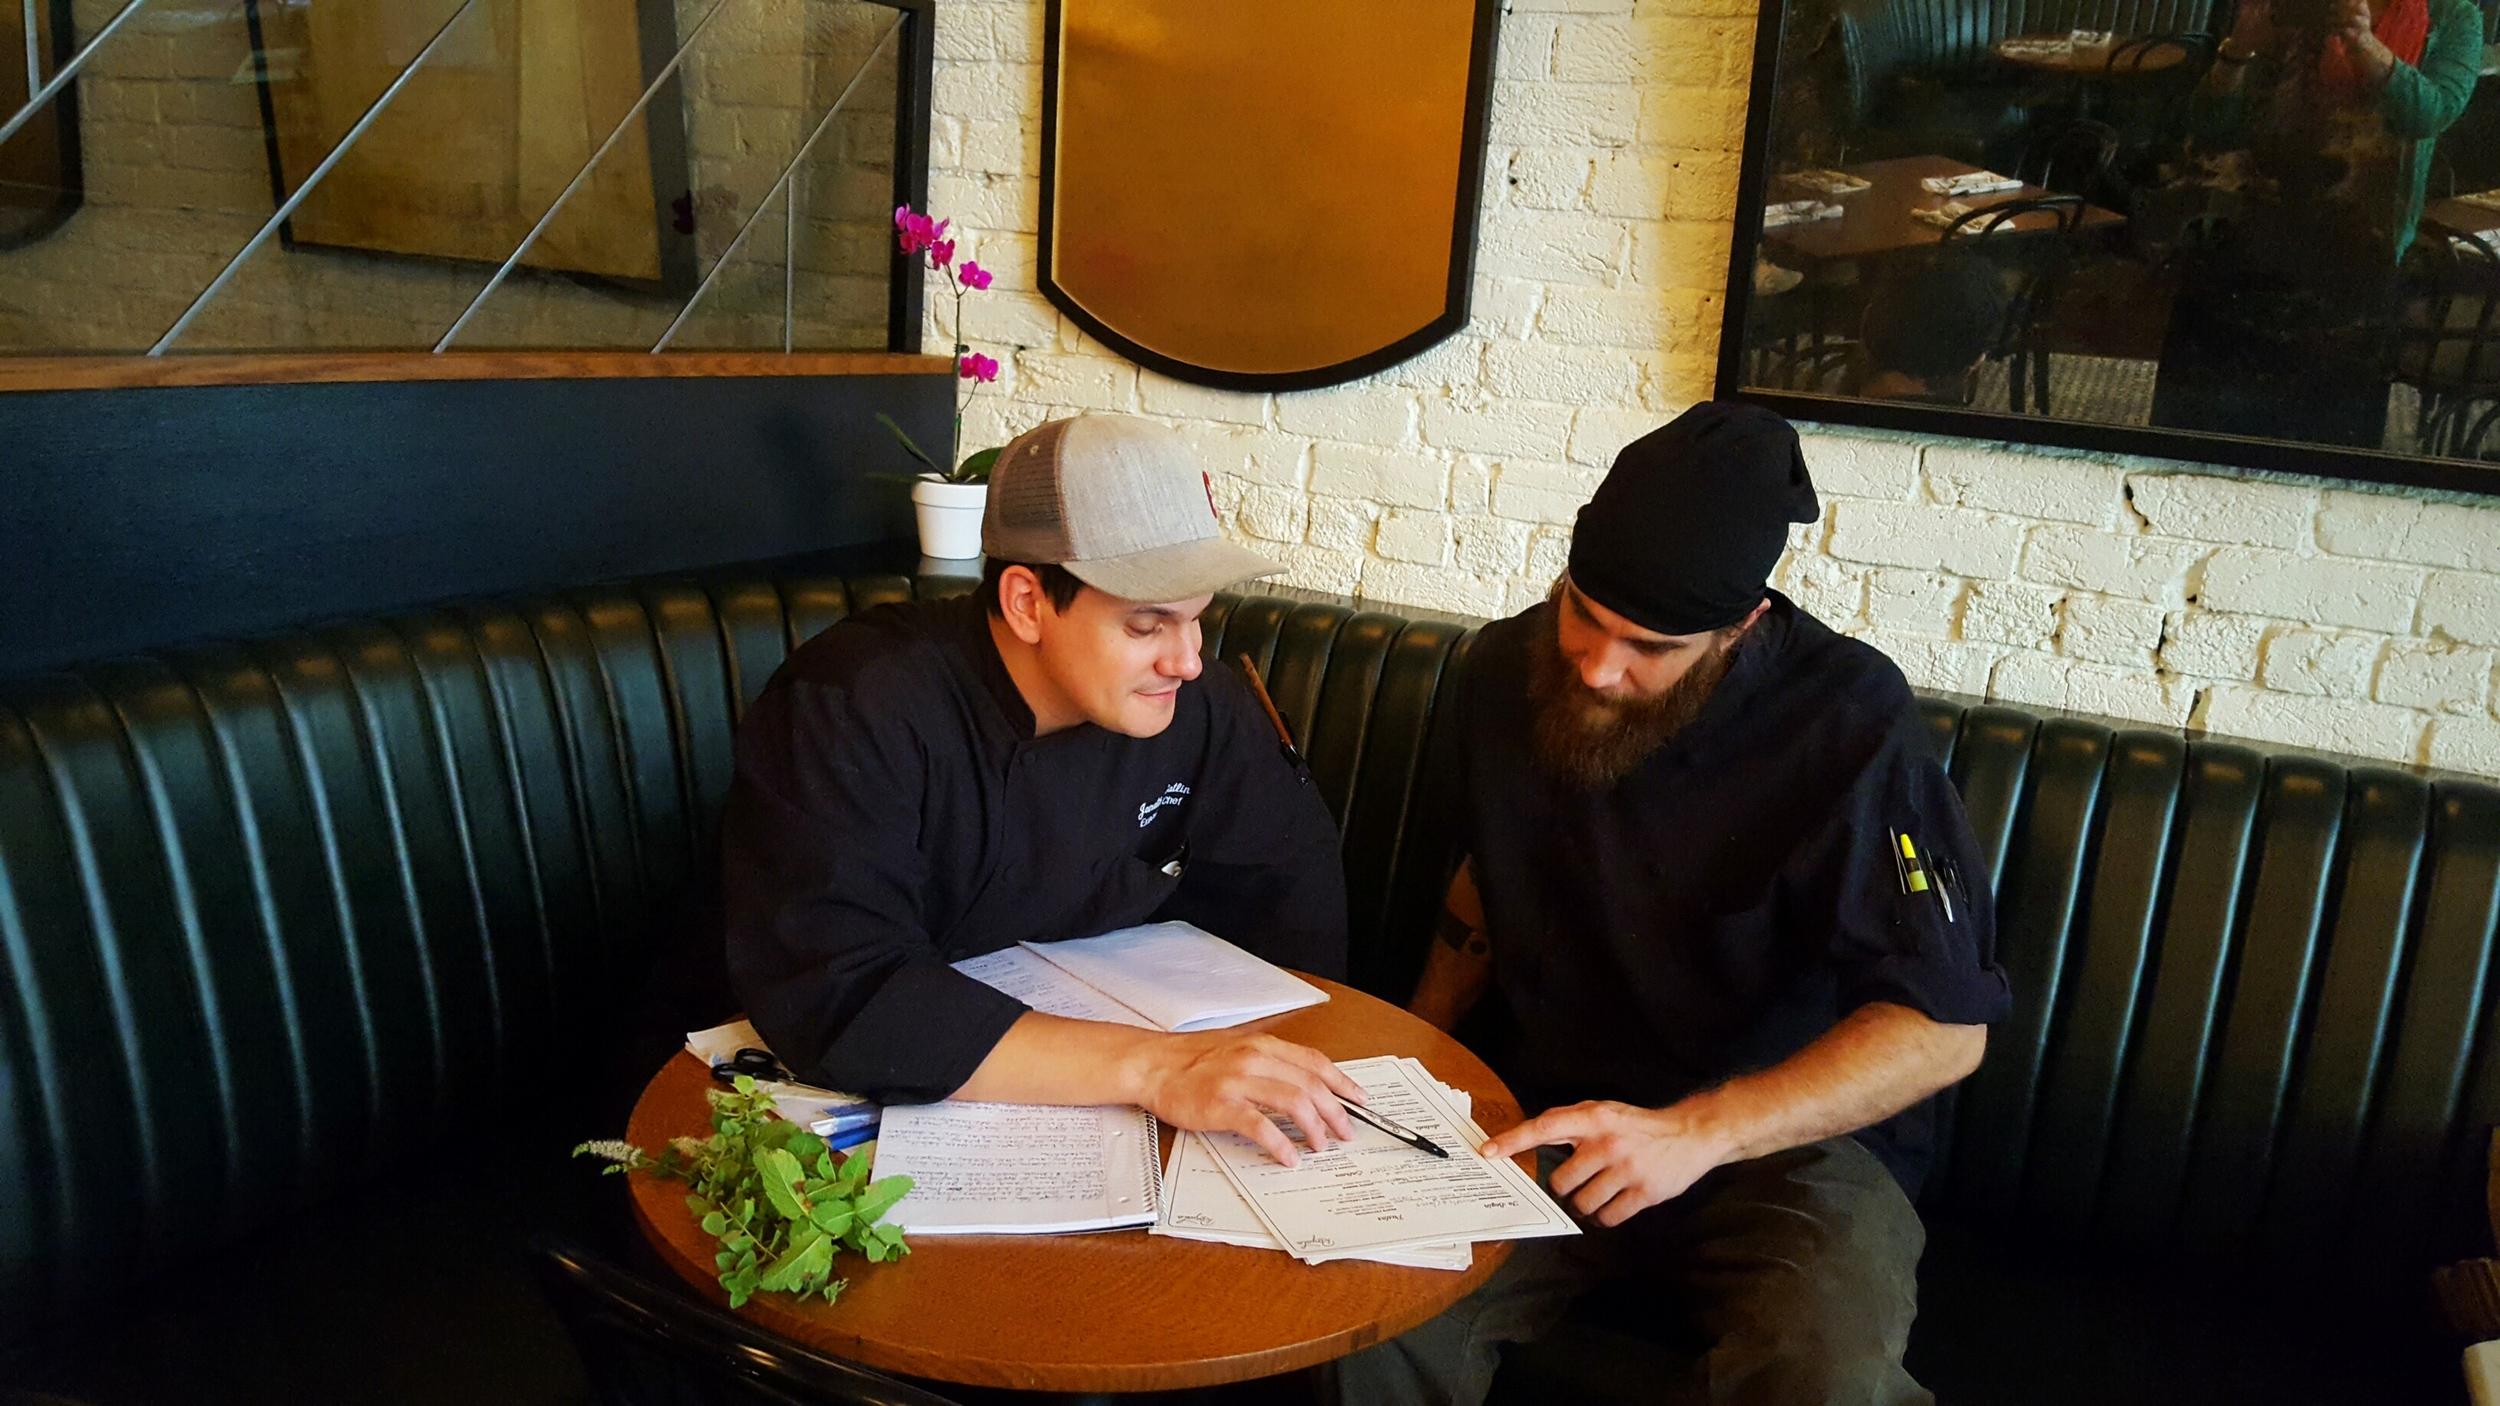 Chef+Jon+Gatlin_Farmers+Market+2016.jpeg